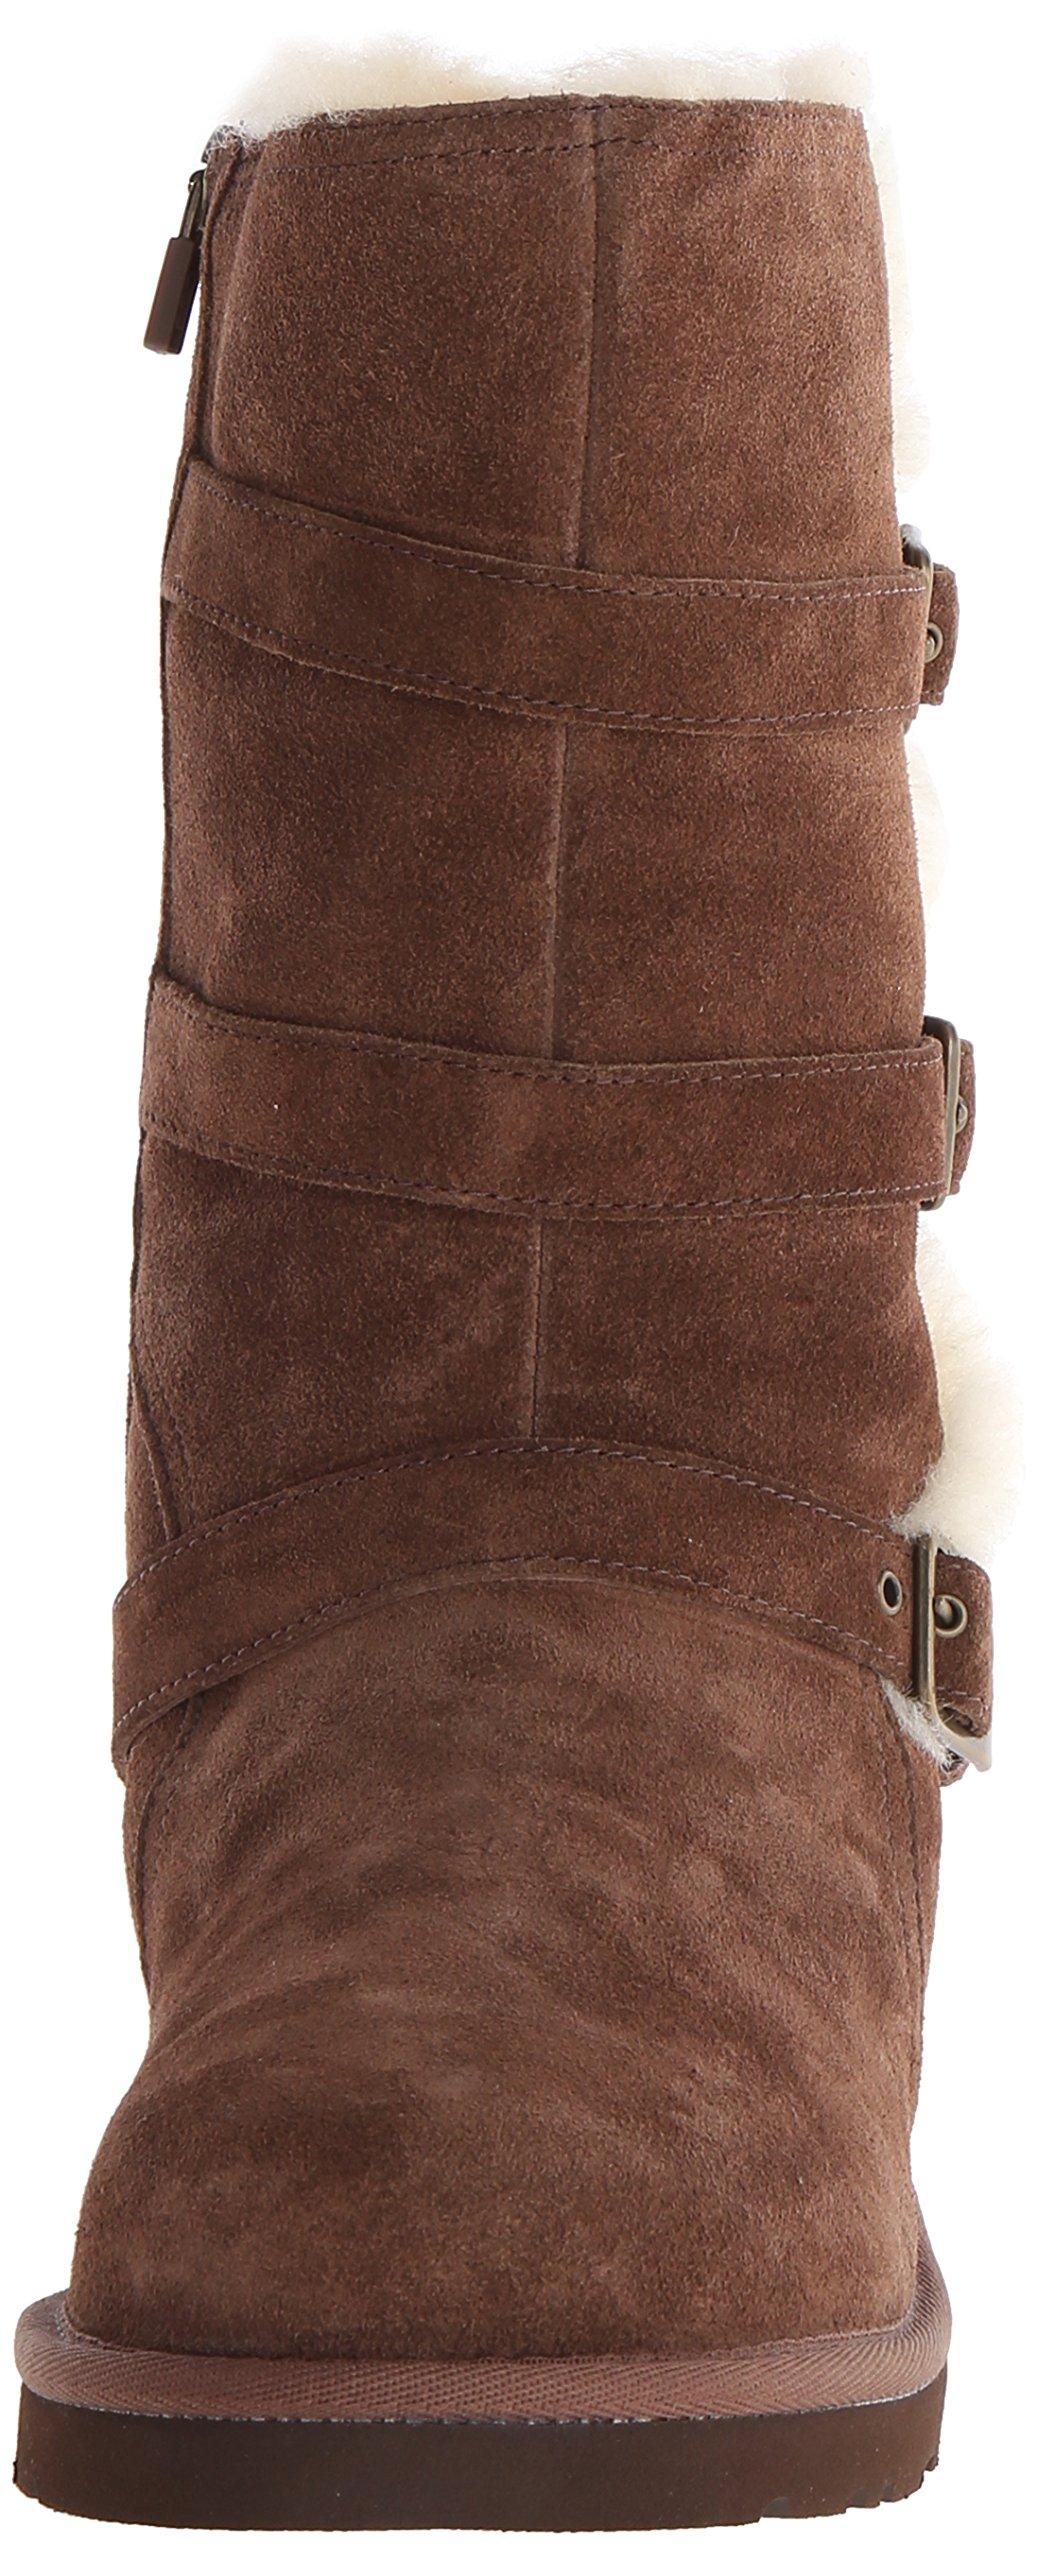 UGG Australia Girls Maddi Chocolate Western Boot - 5 by UGG (Image #4)